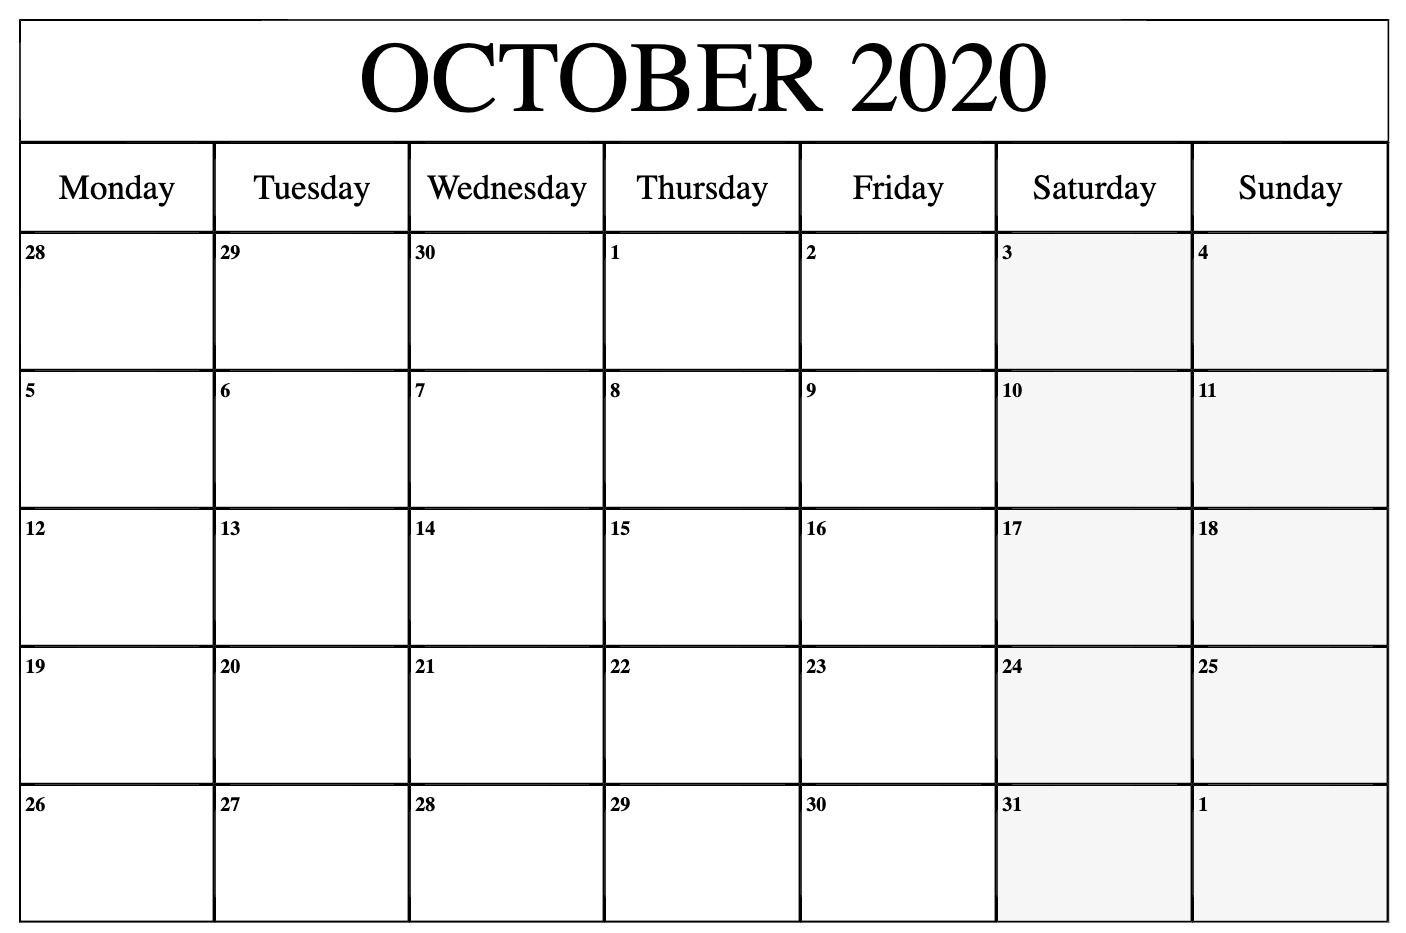 October 2020 Calendar Pdf, Word, Excel Template 1